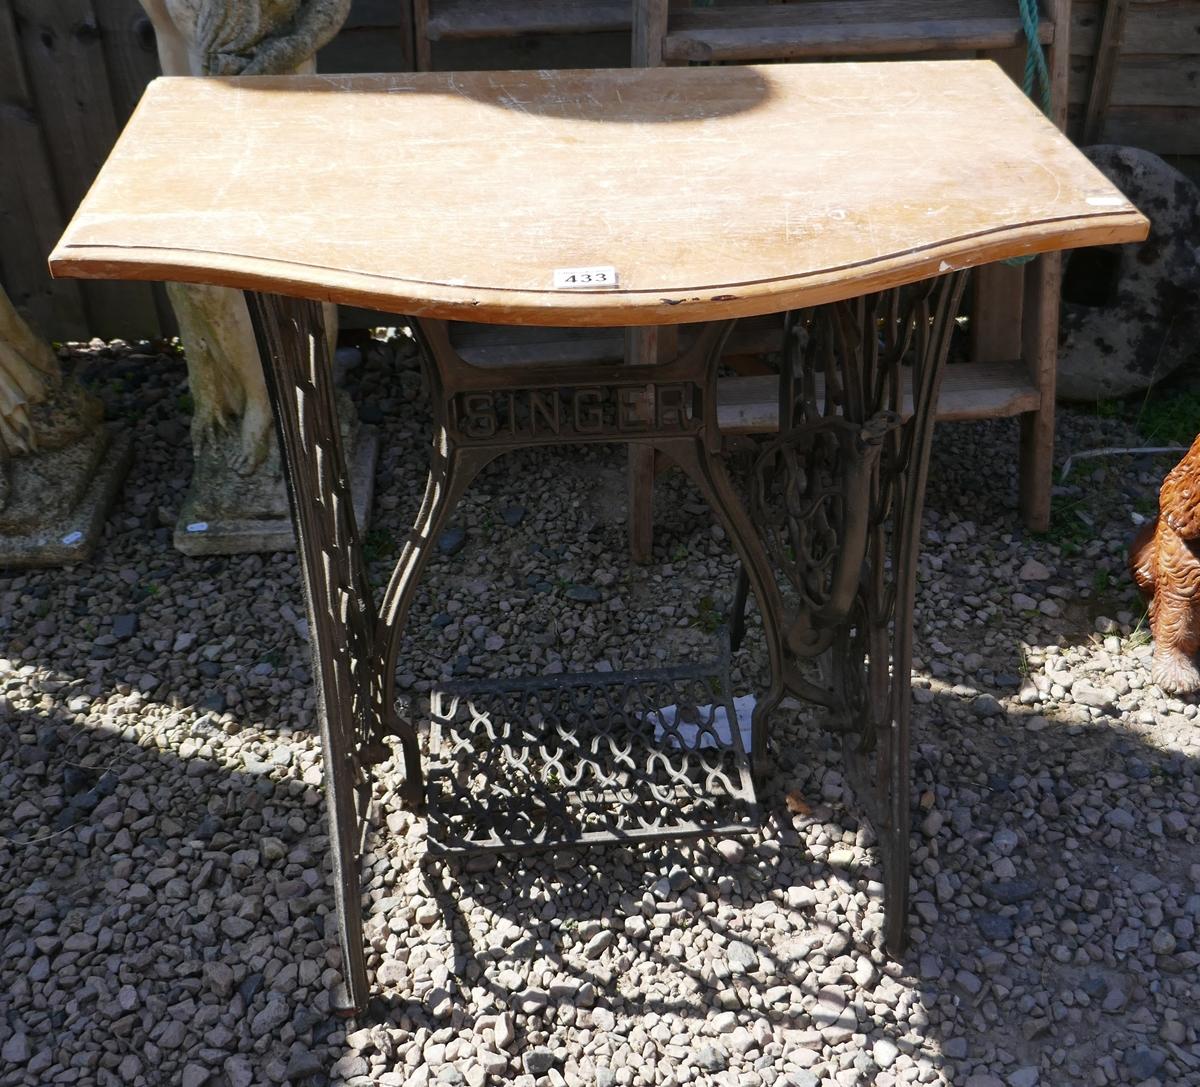 Singer sewing machine base table